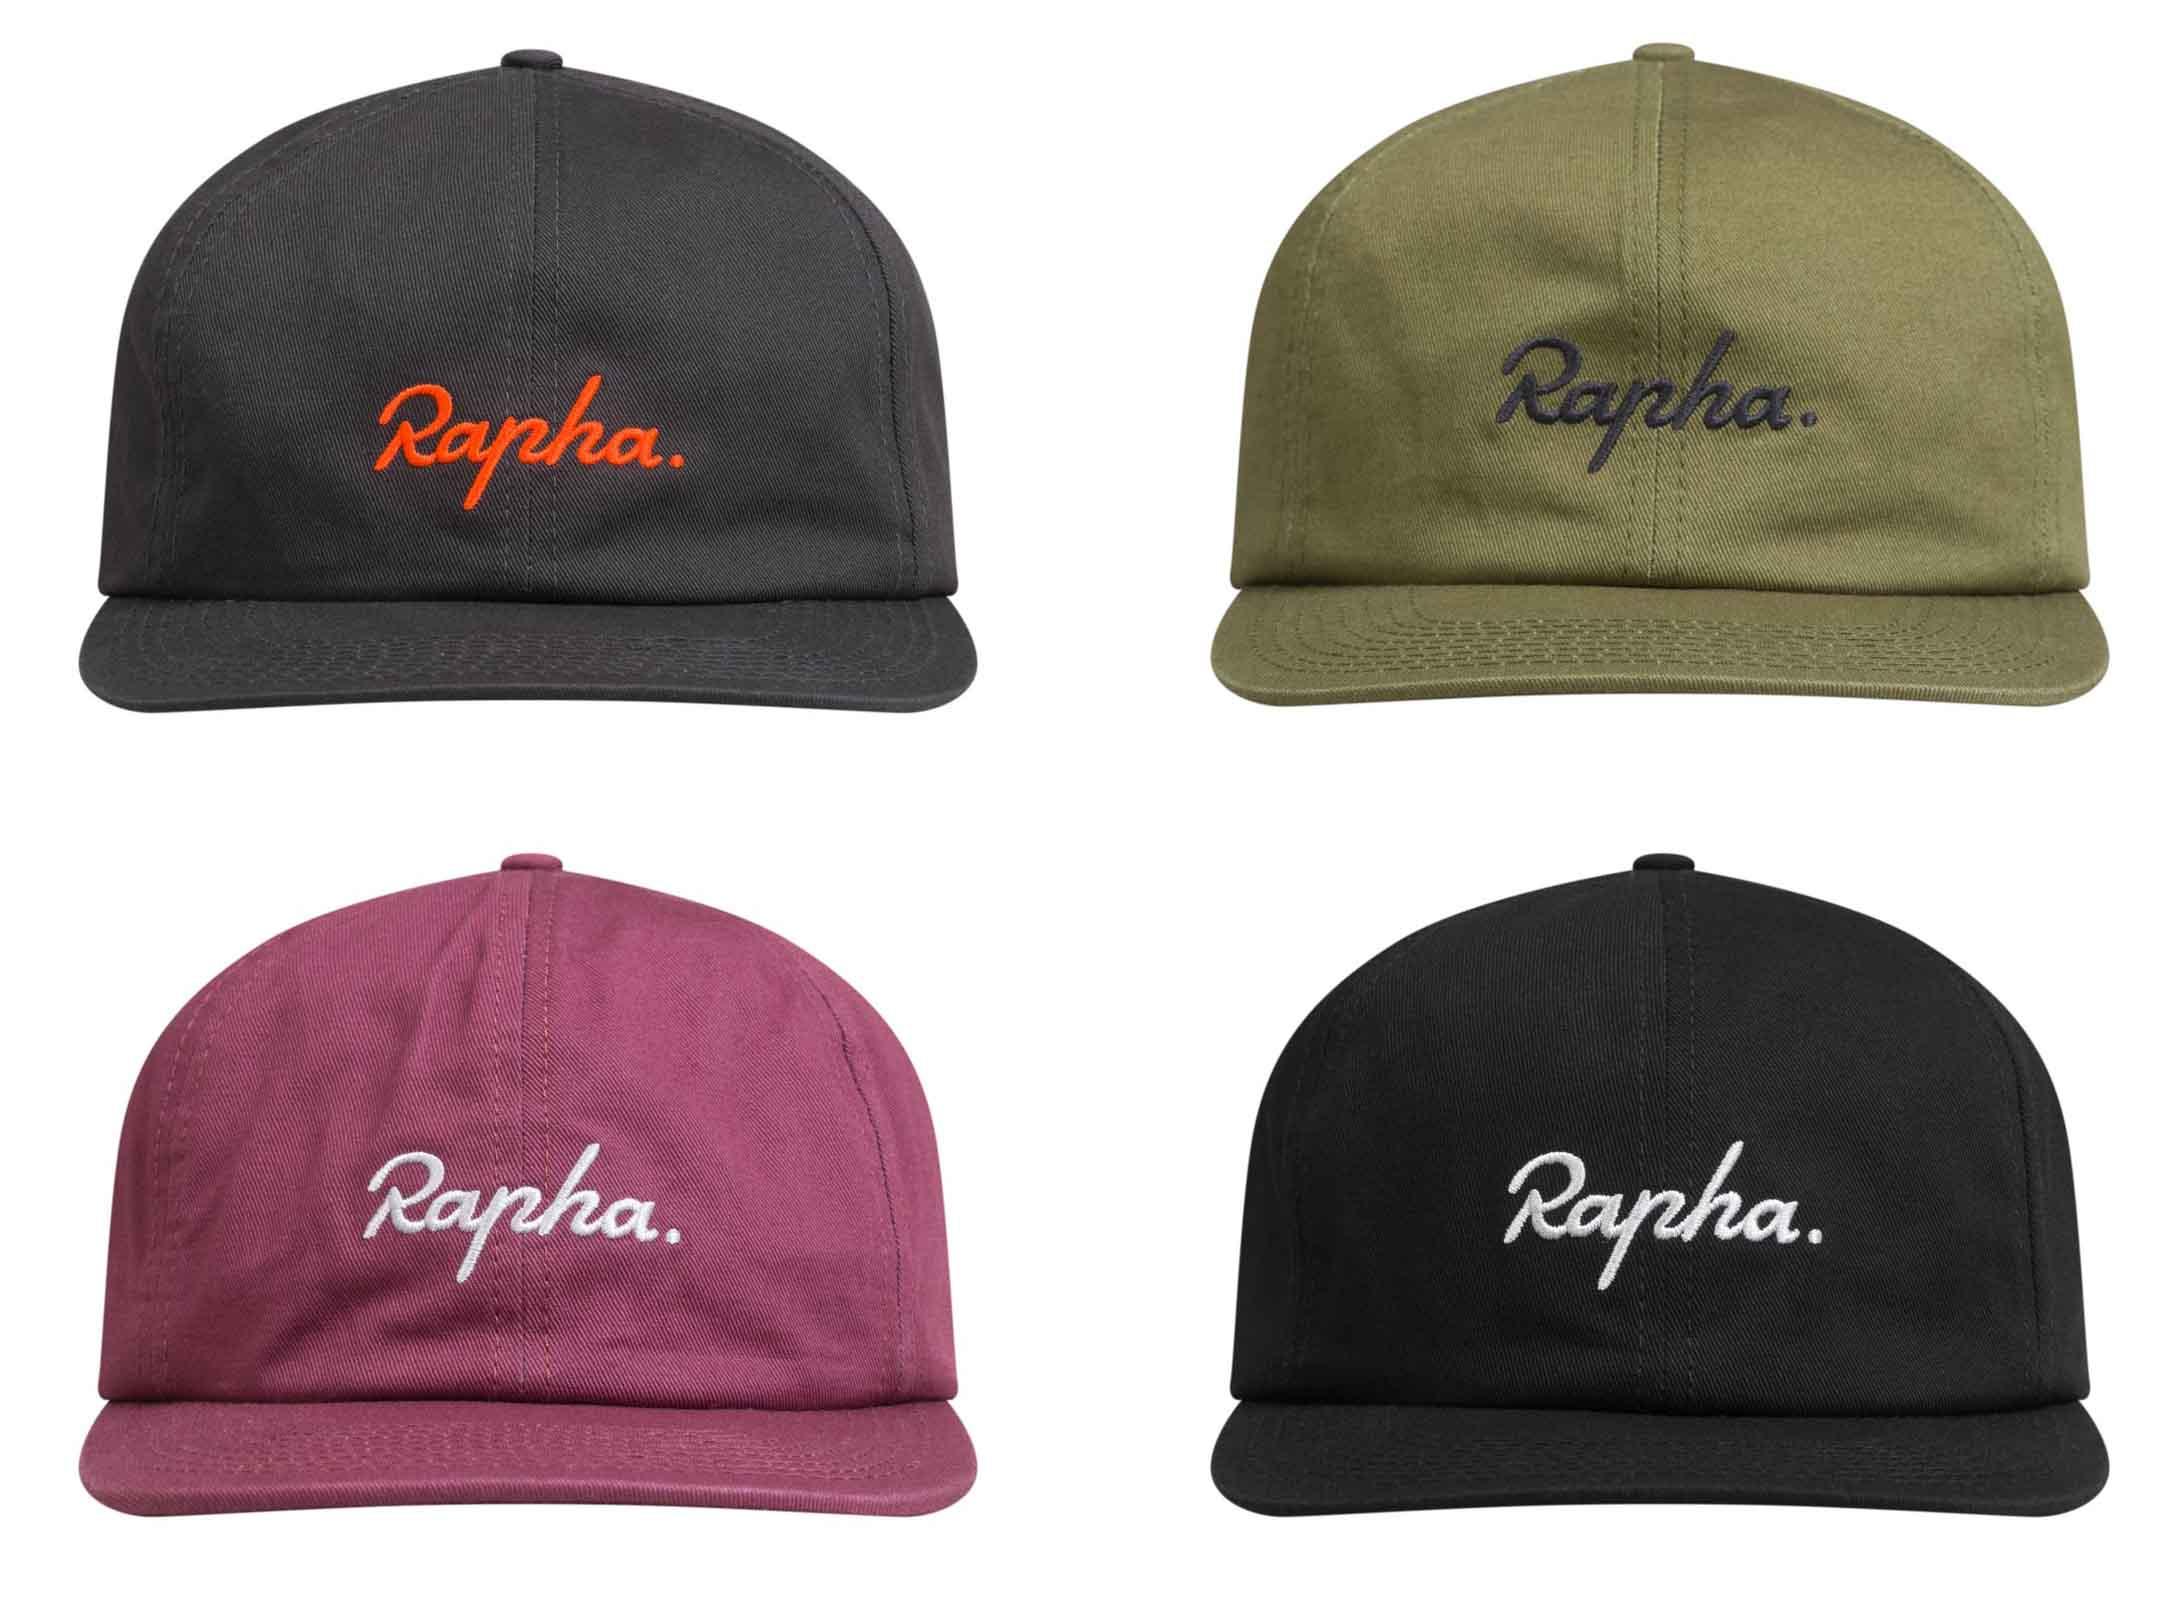 Rapha Performance Trailwear hat